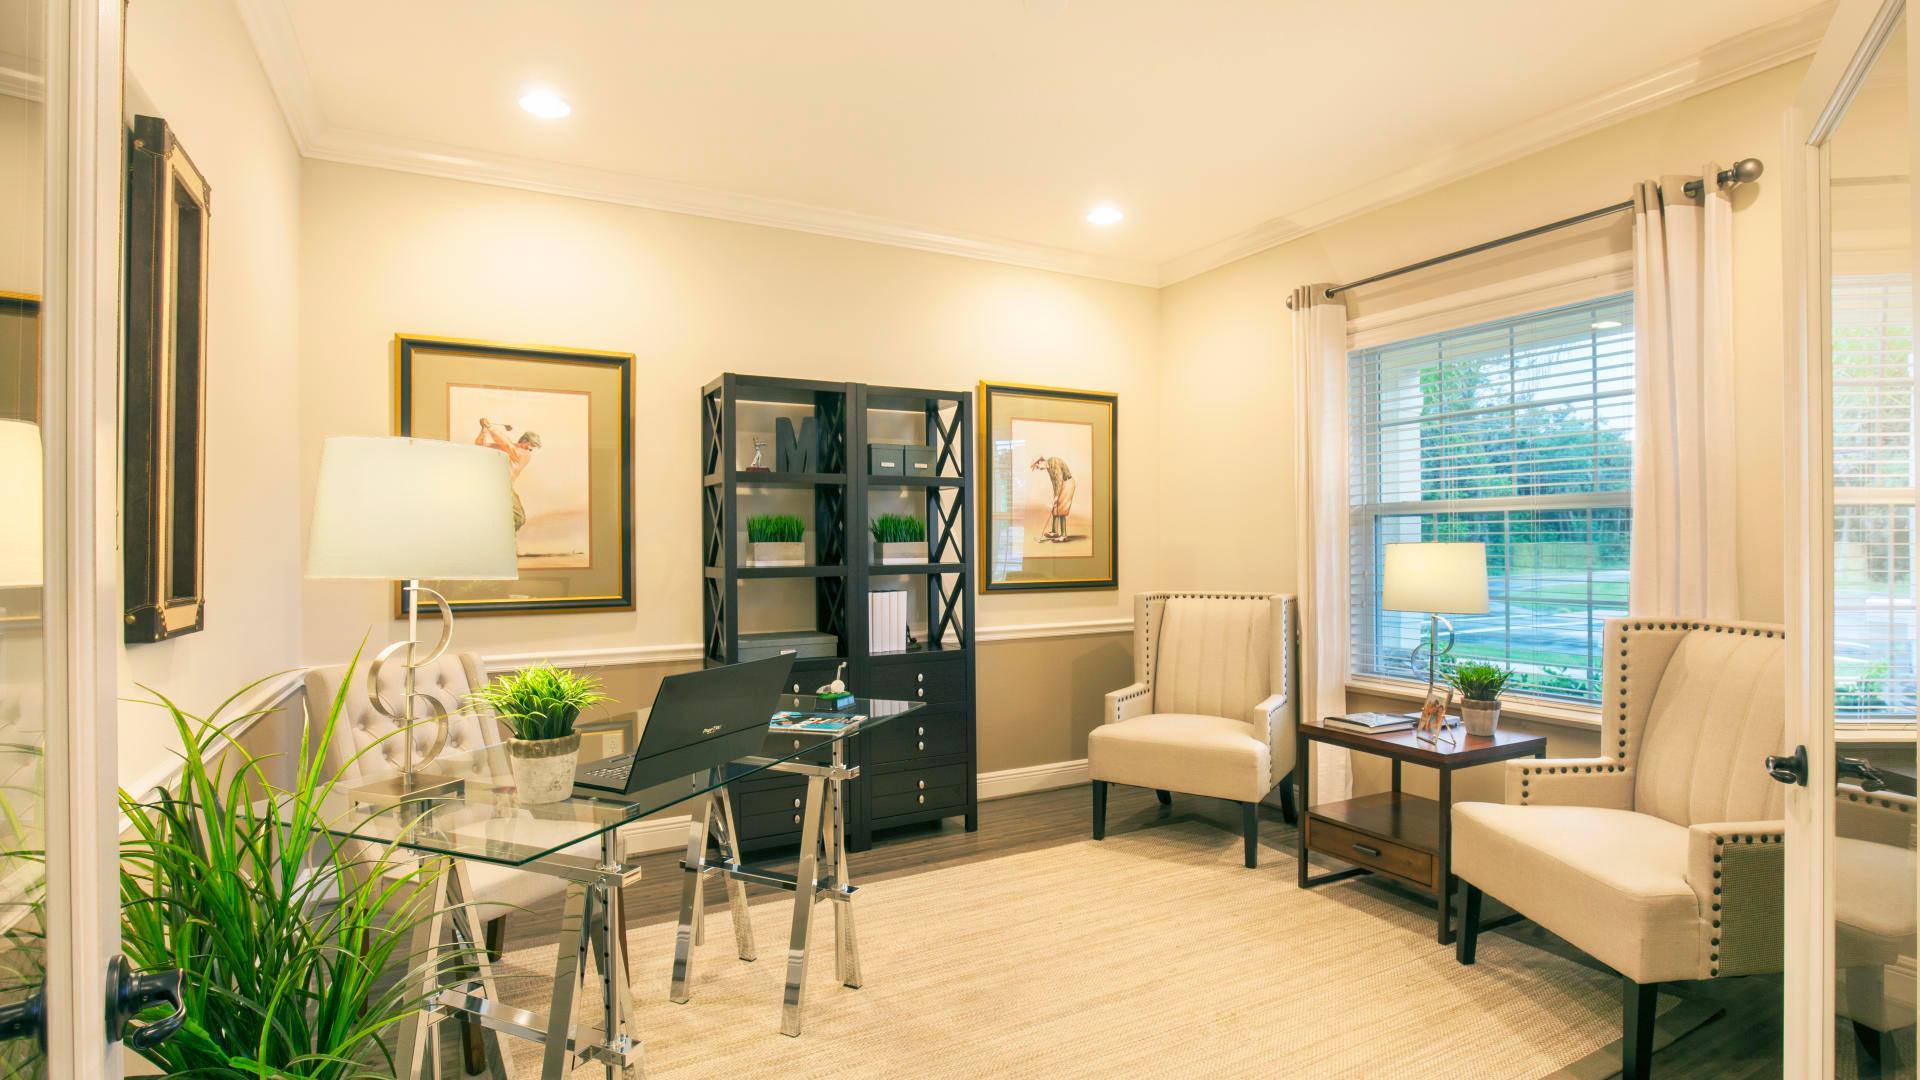 Living Area featured in the Livorno By Maronda Homes in Sarasota-Bradenton, FL